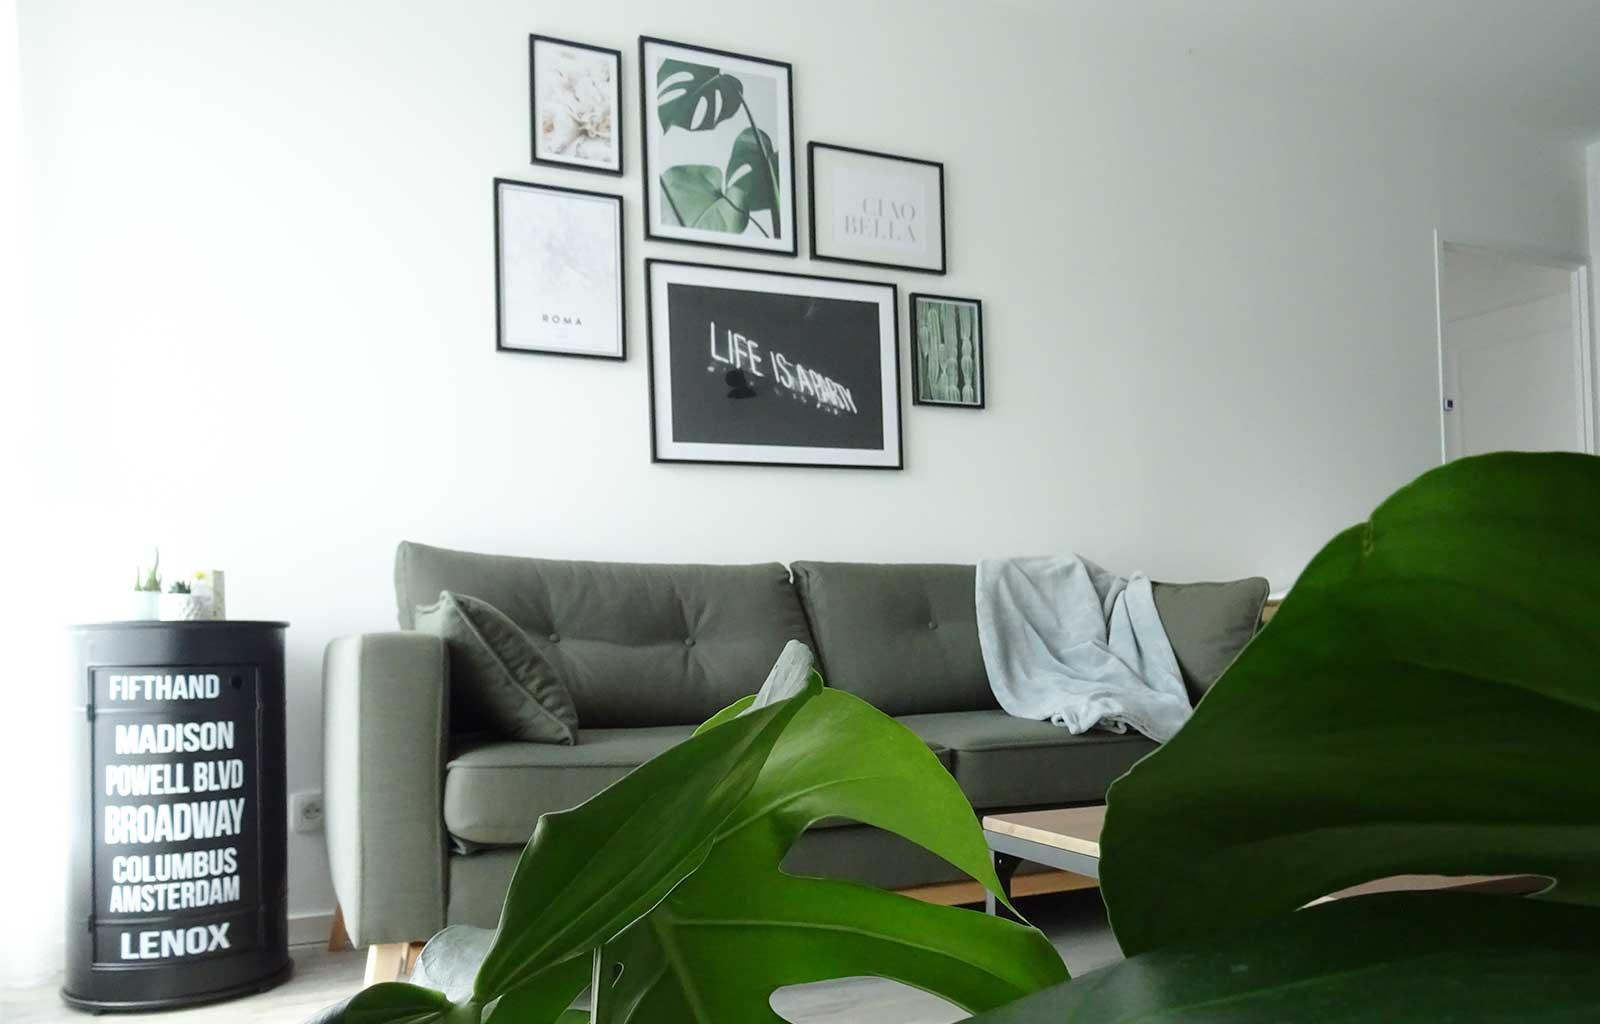 décoration posters affiches cadres salon poster store